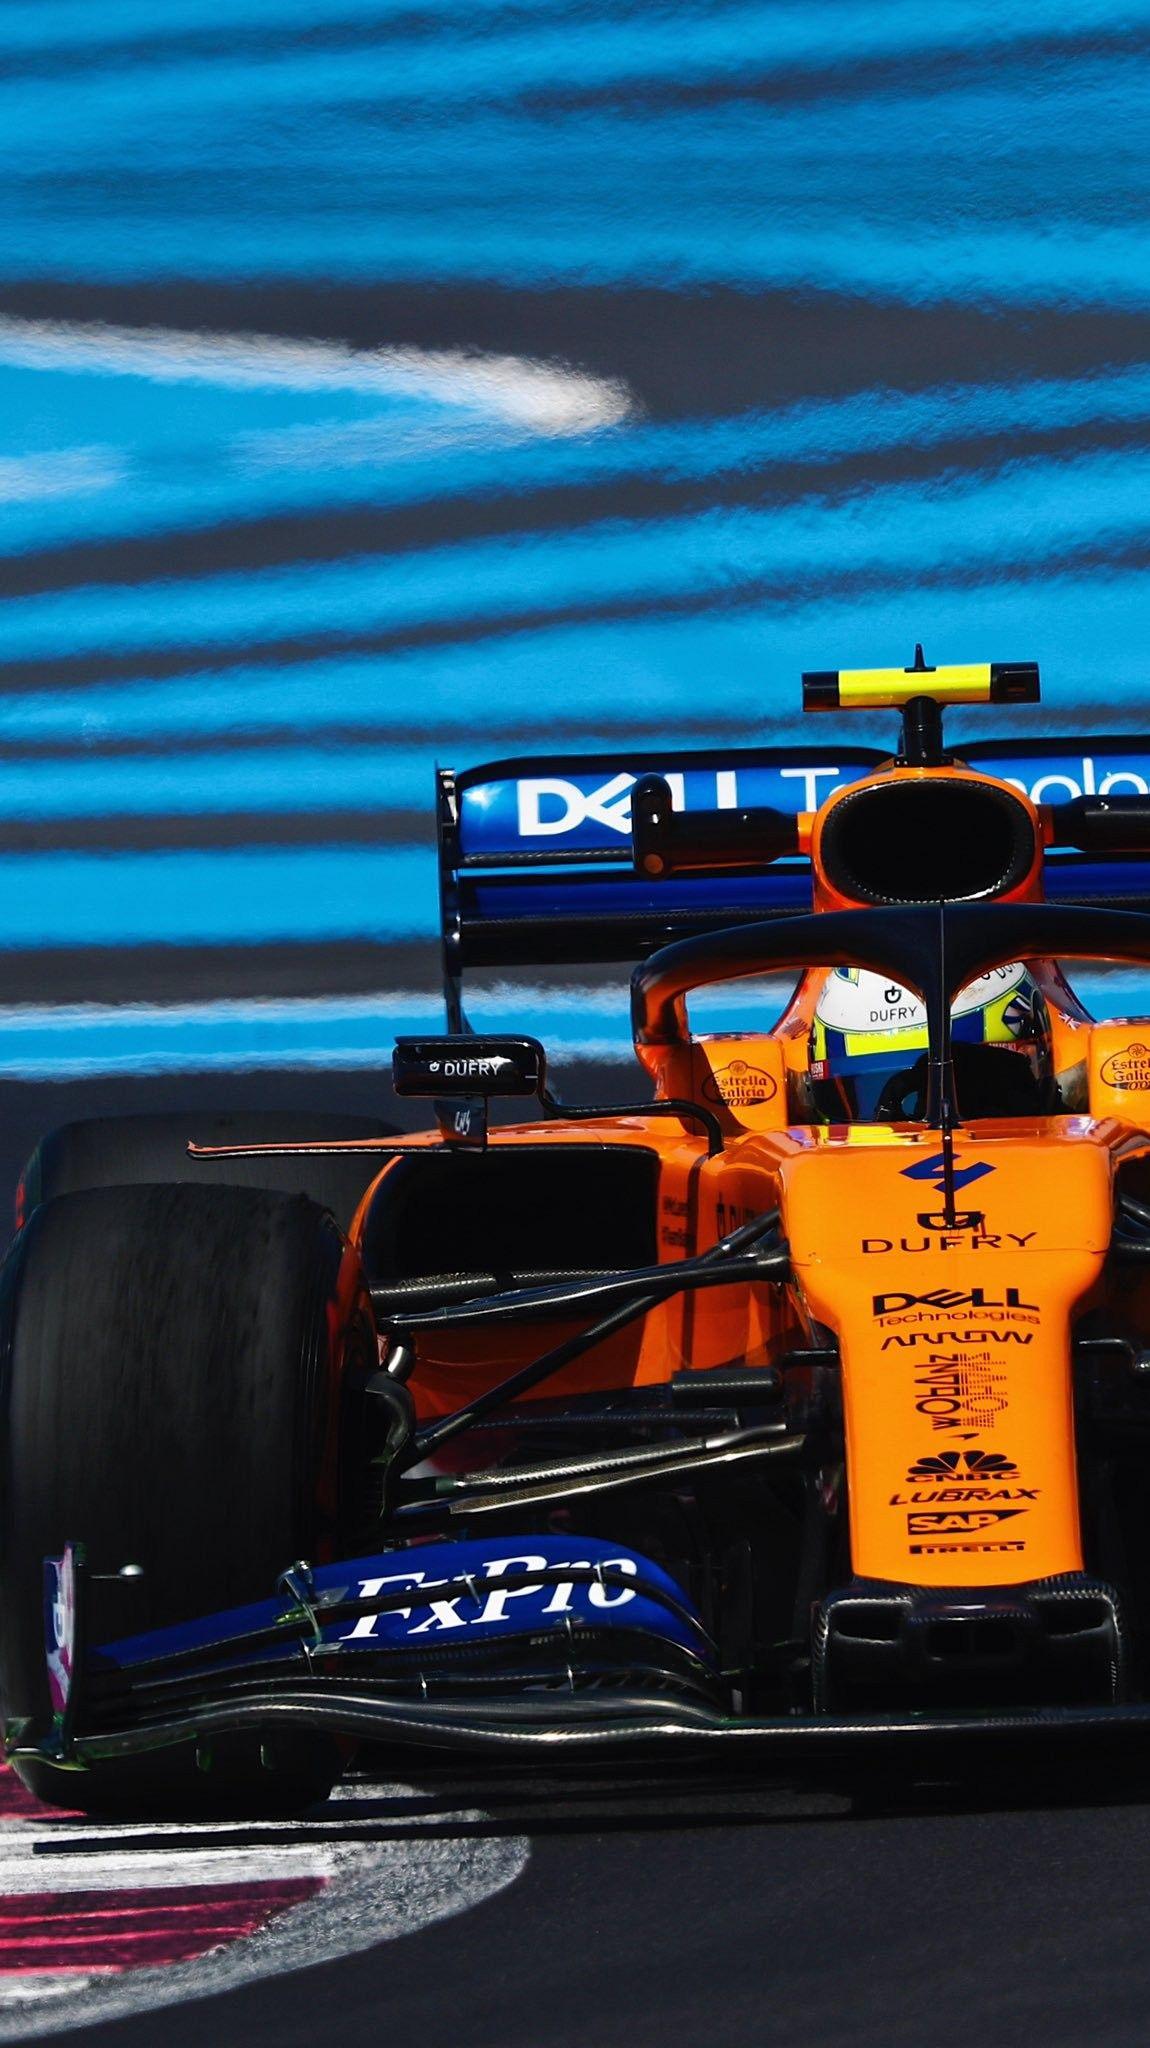 Pin By Juli On Mclaren Mclaren Formula 1 Mclaren F1 F1 Wallpaper